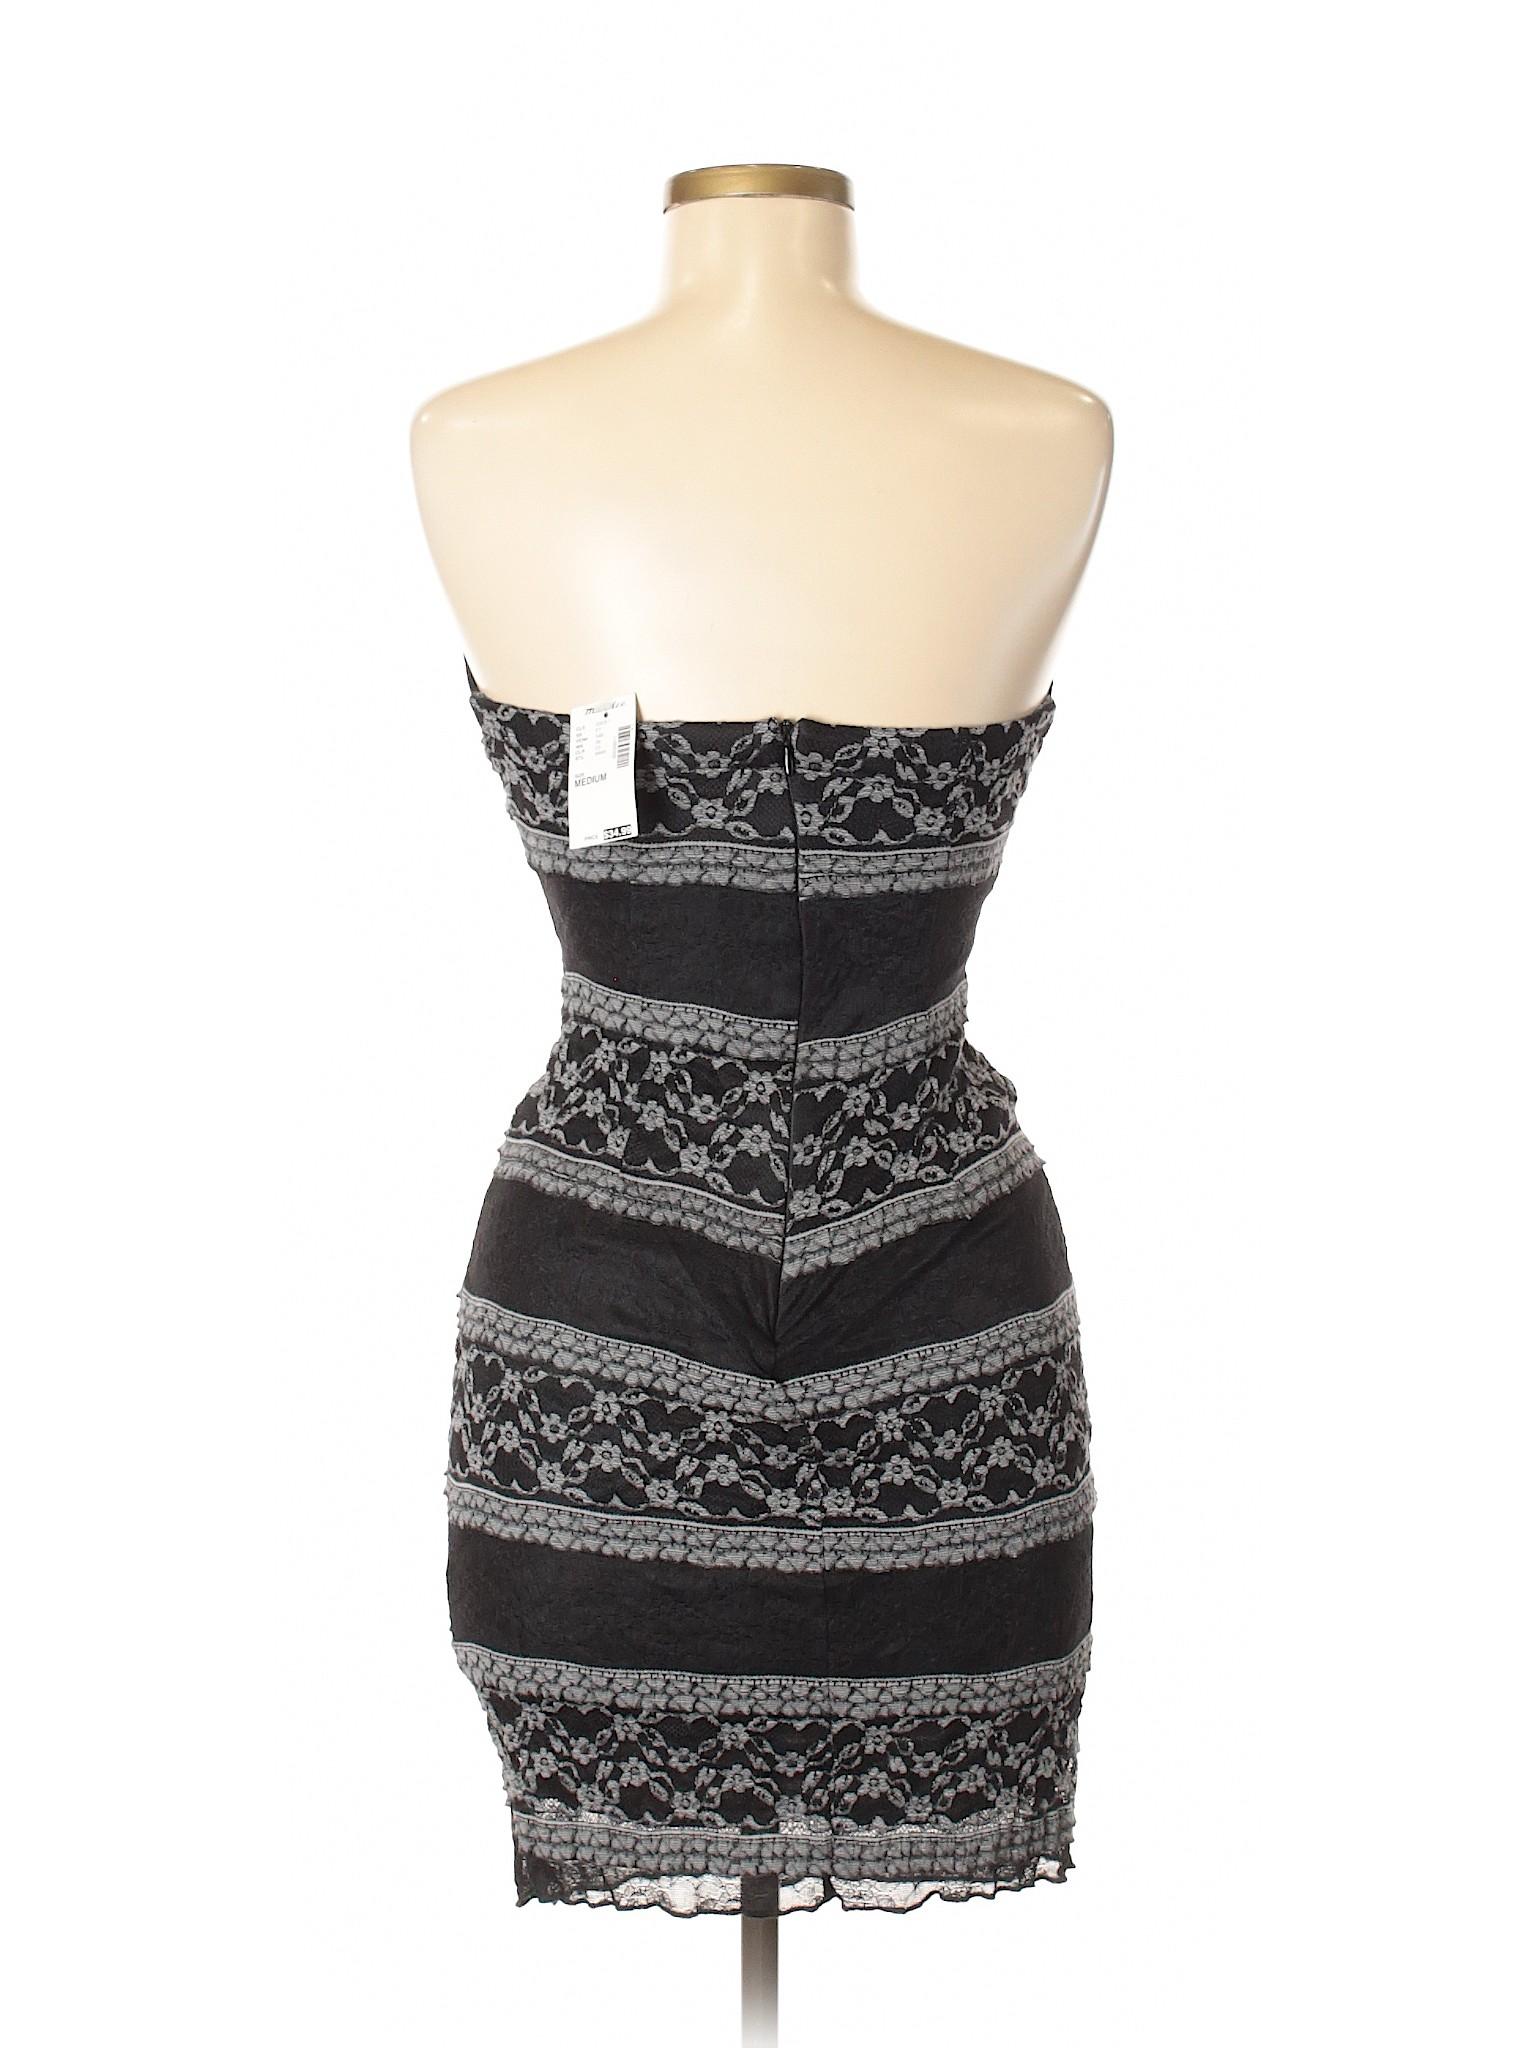 Casual Selling Mystic Mystic Dress Selling vqvUwtBxnz